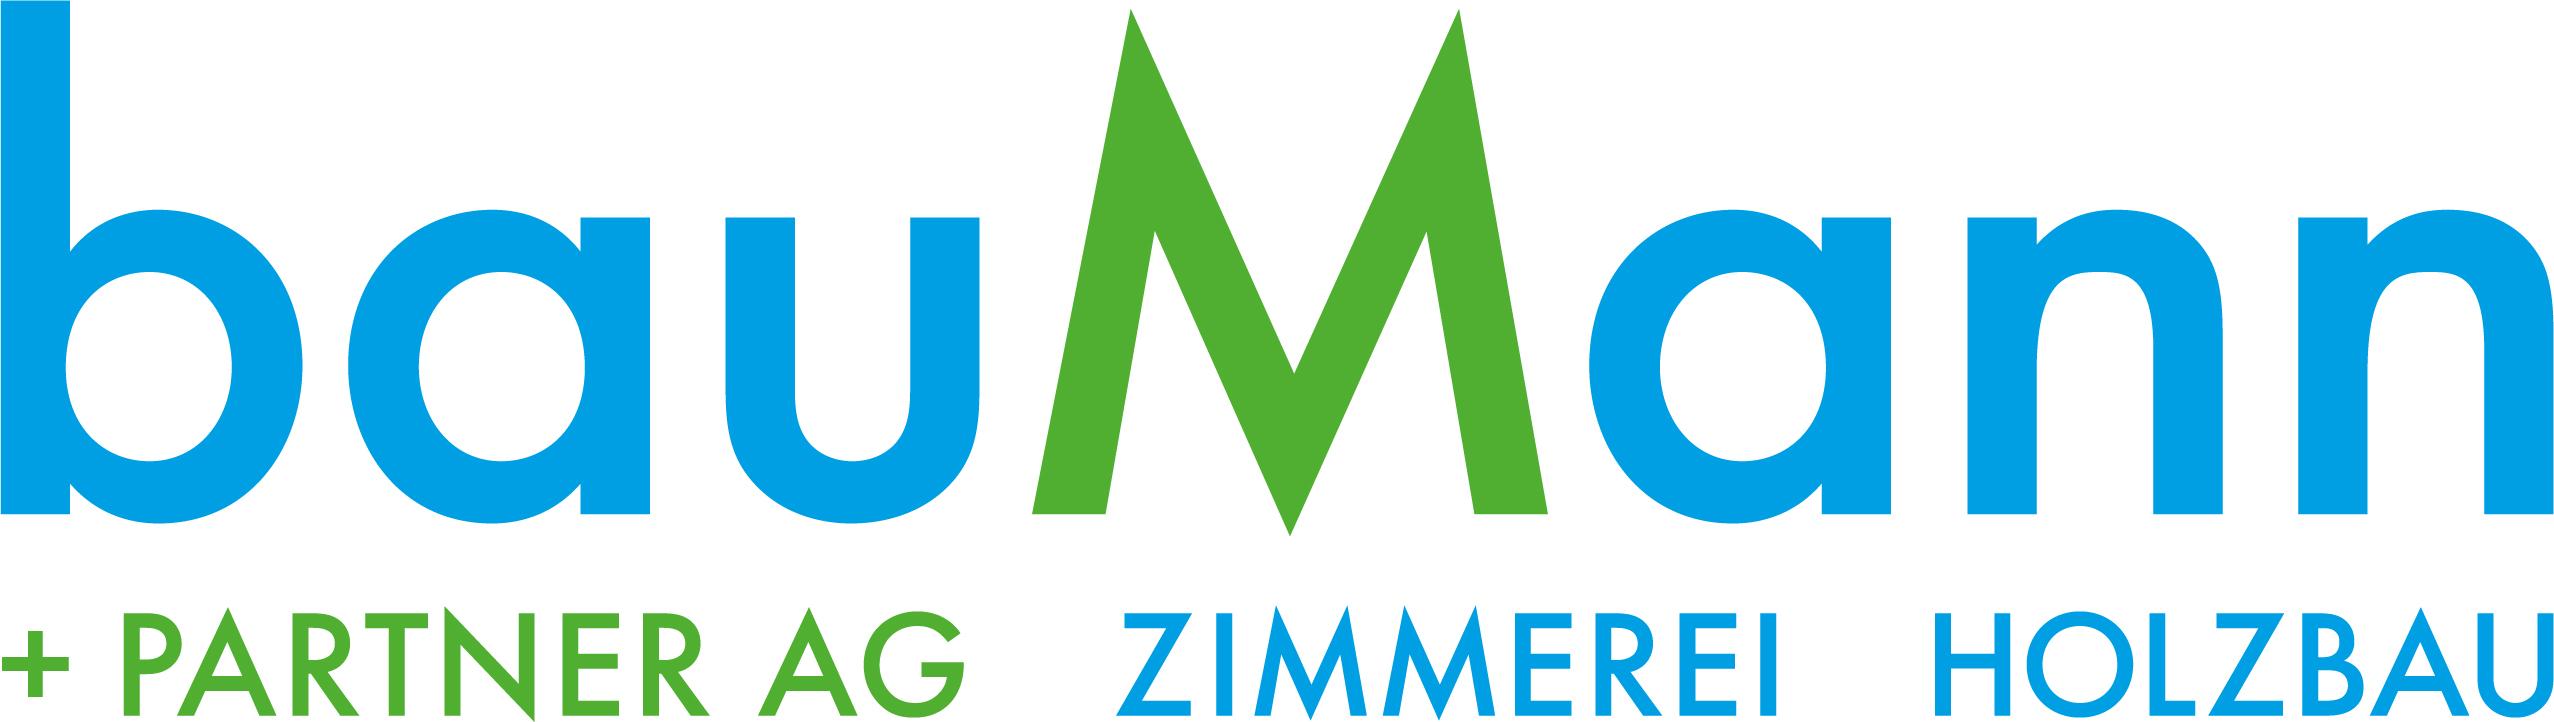 Baumann + Partner AG